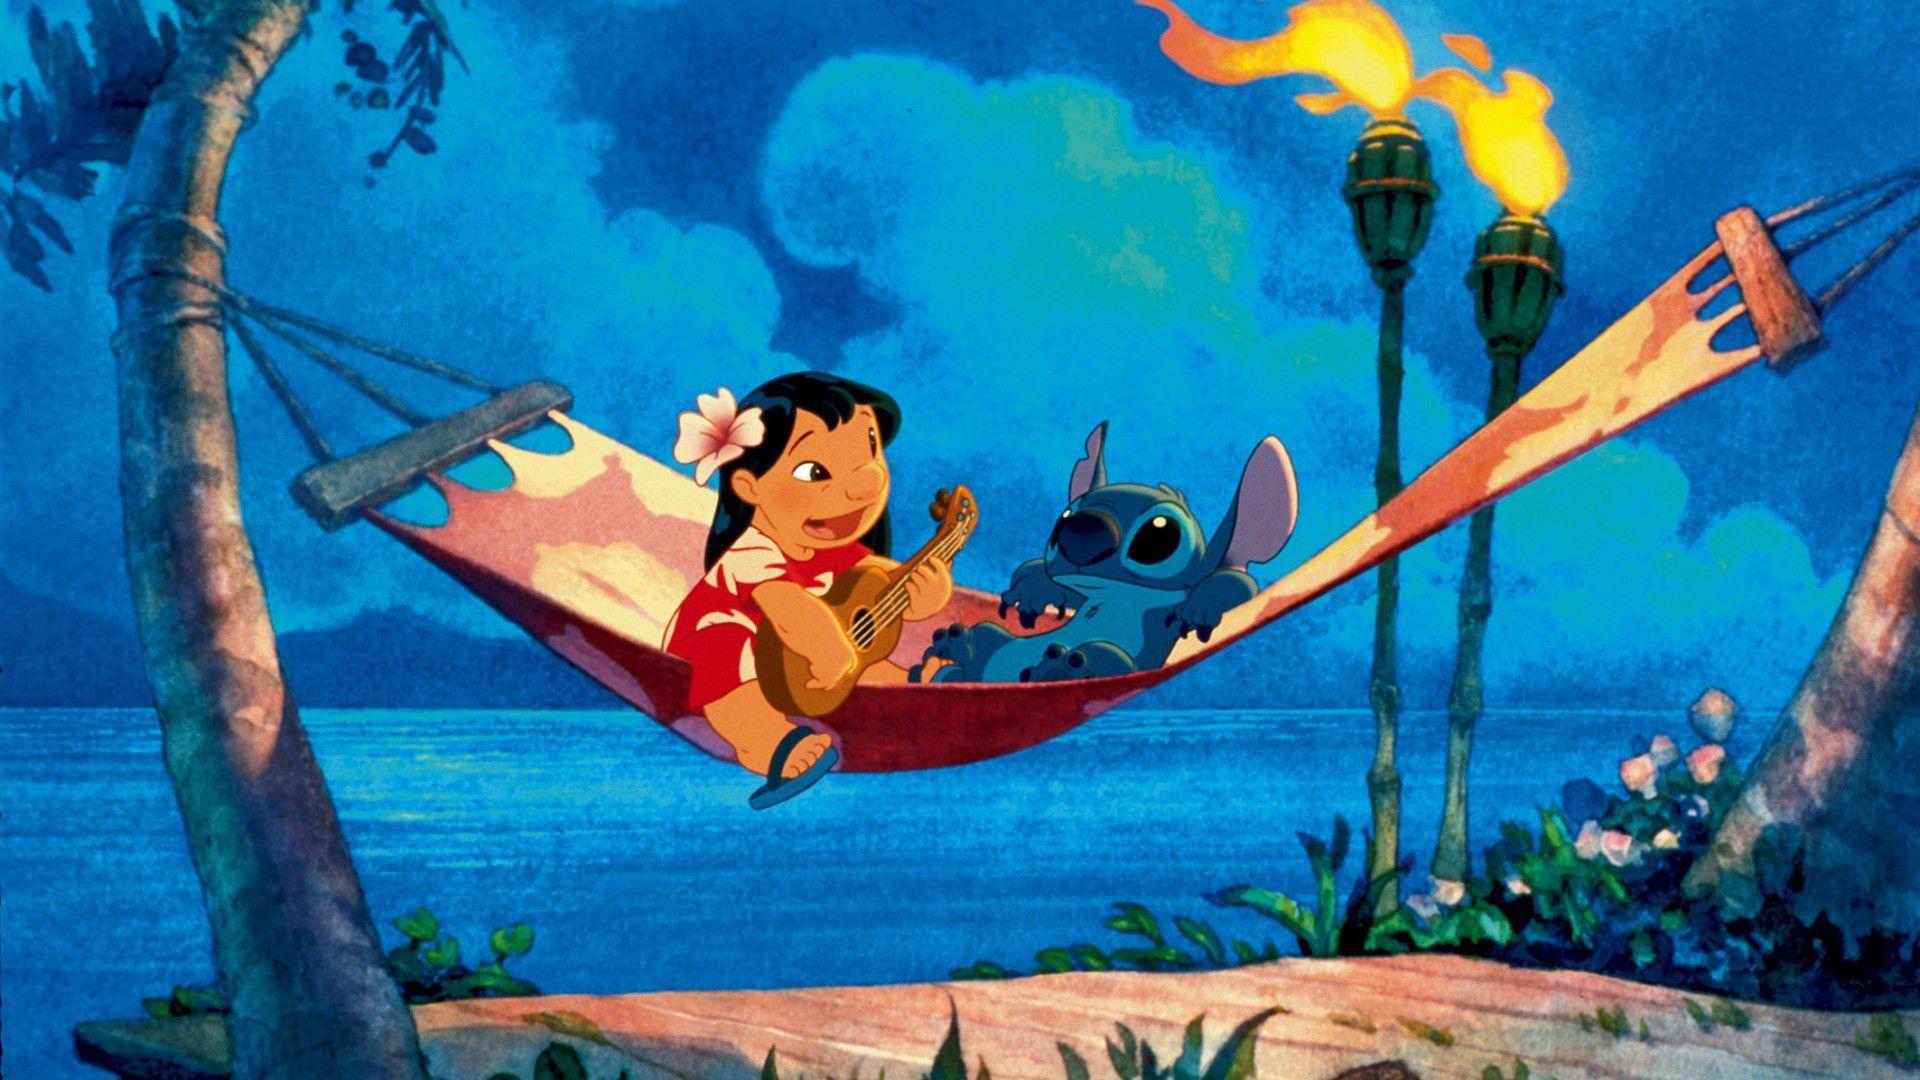 Disney's Lilo and Stitch (2002)